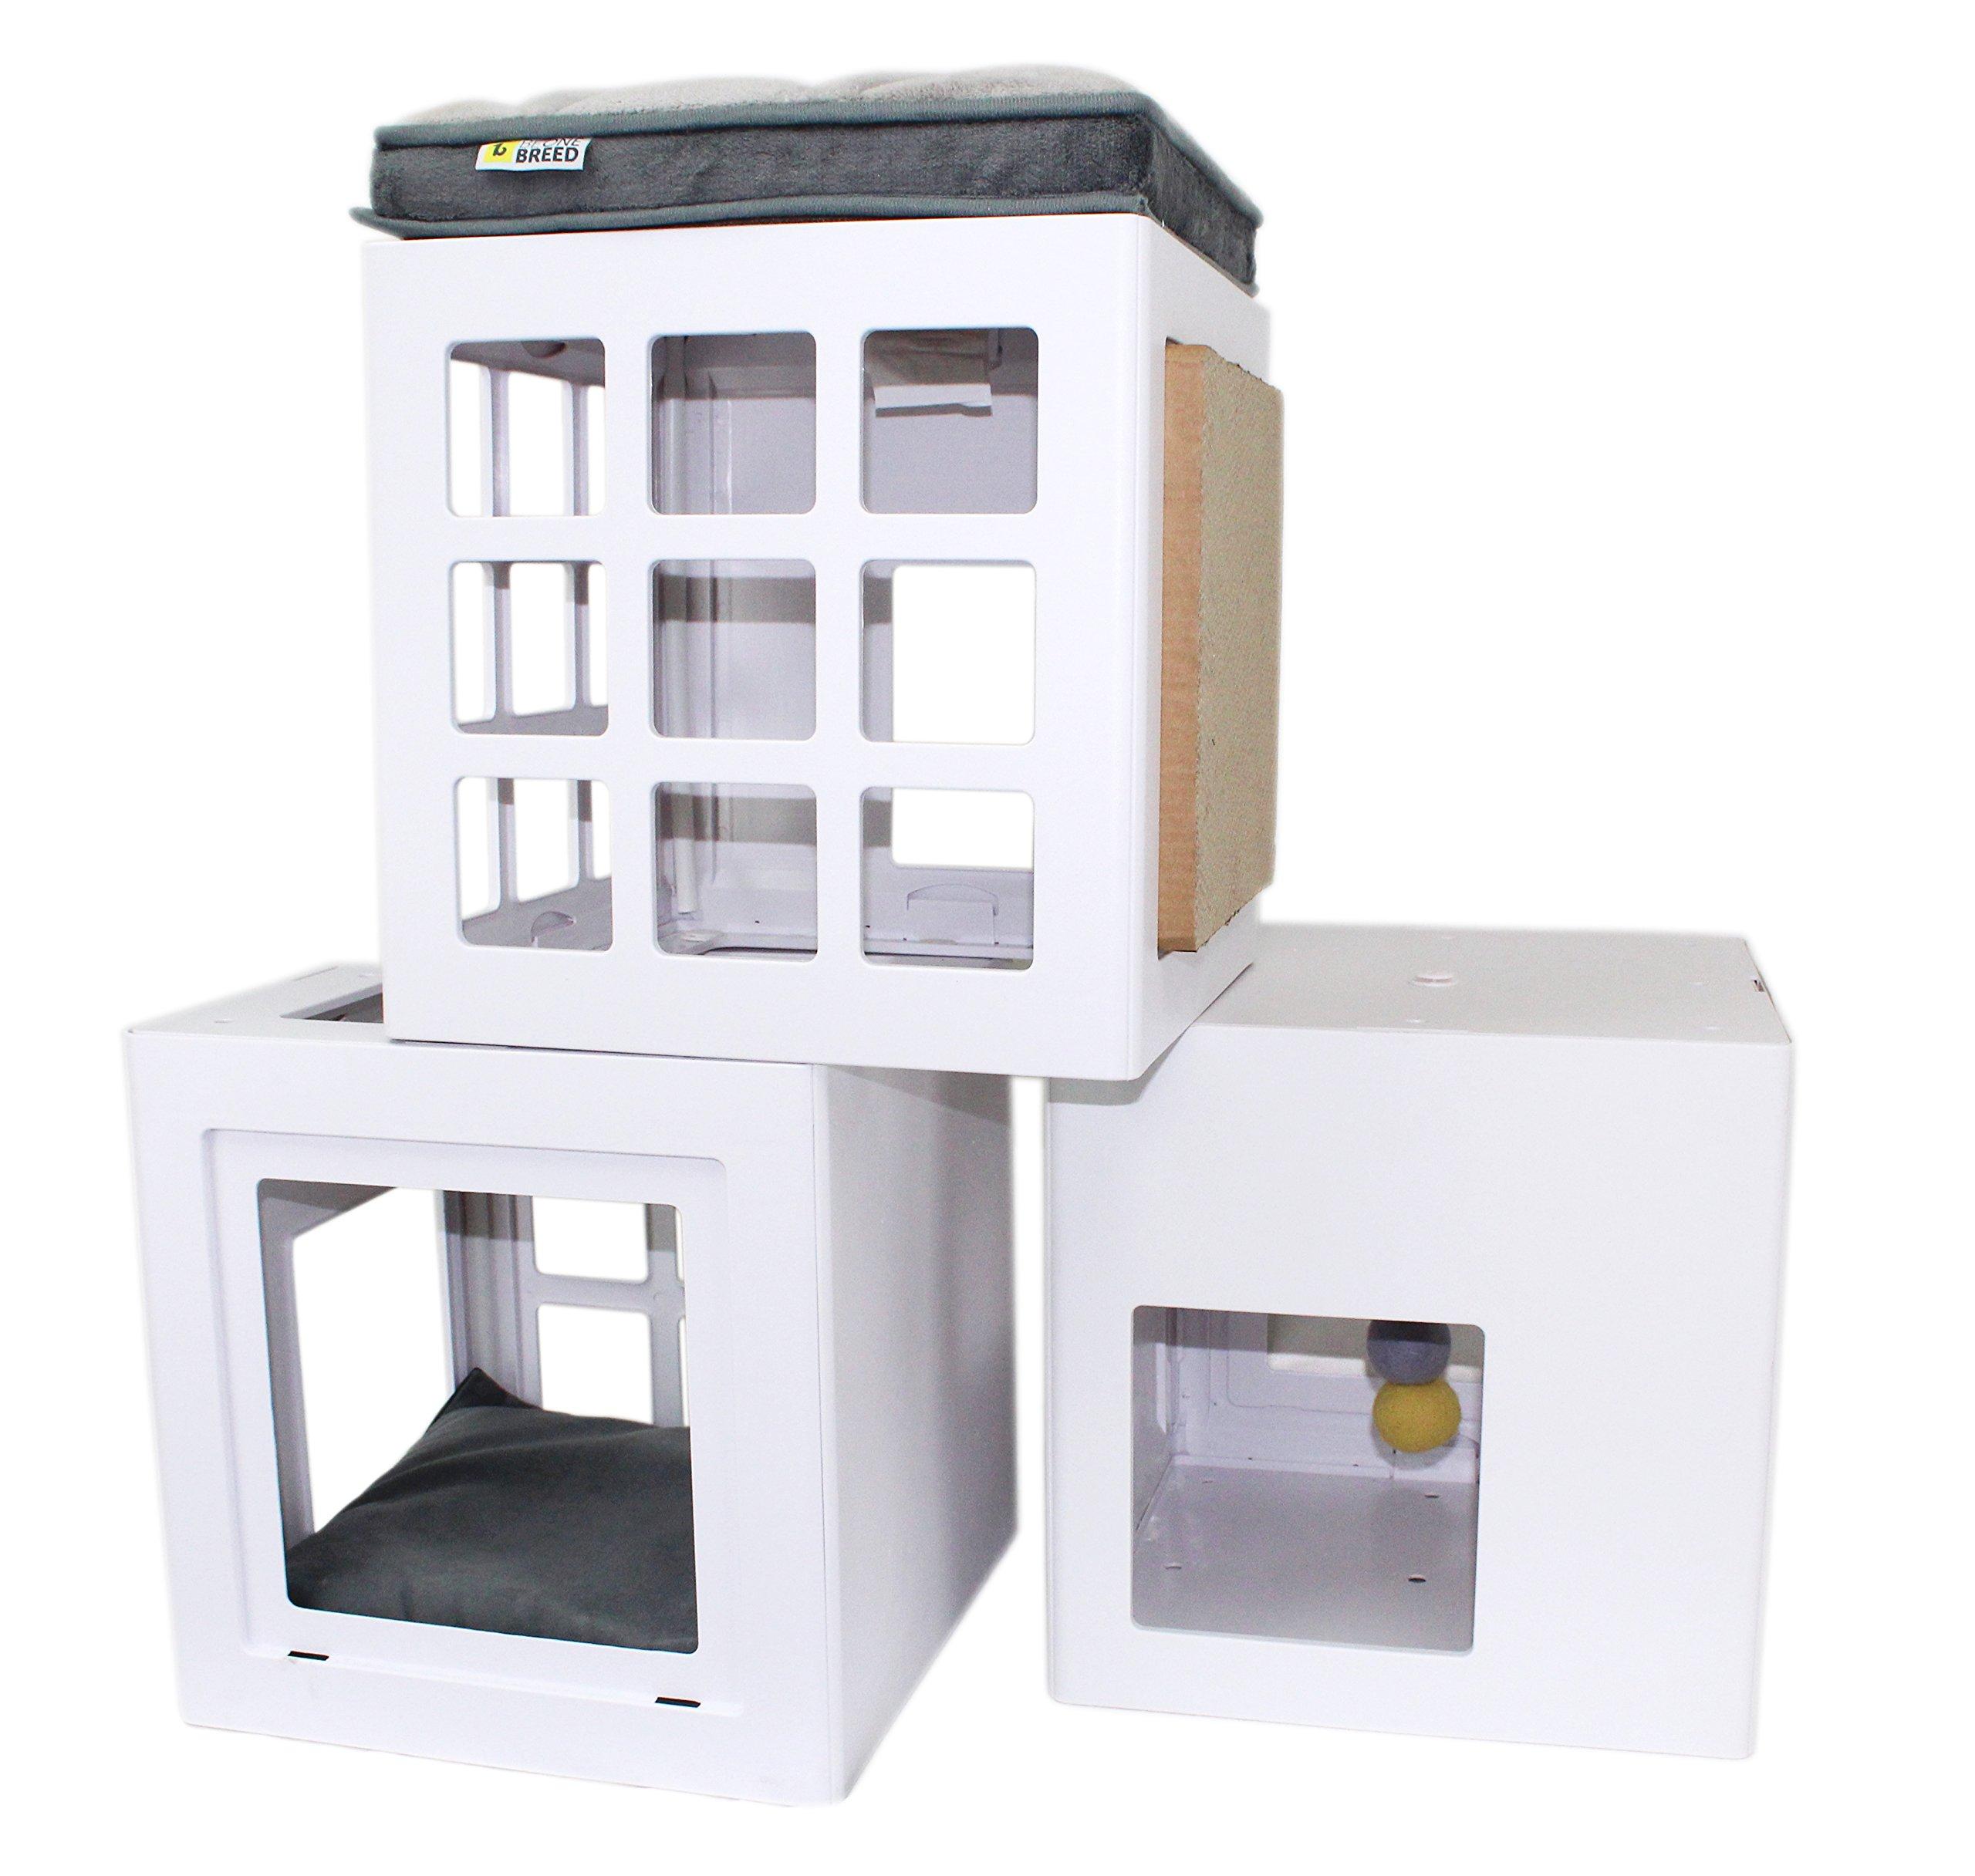 BeOneBreed Katt3 Trendy Cat House/Tree Starting Kit